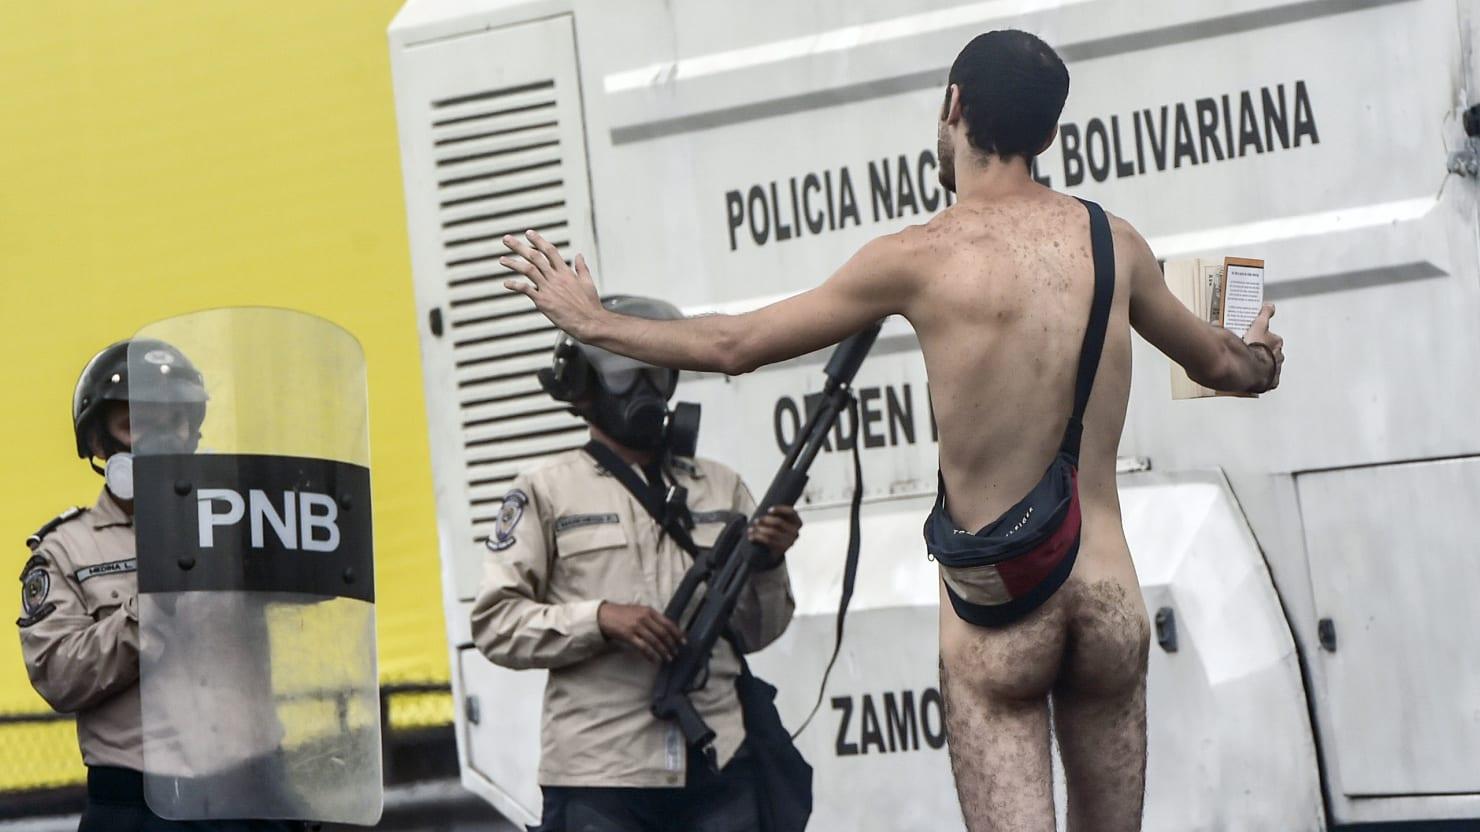 Naked pictures in venezuela